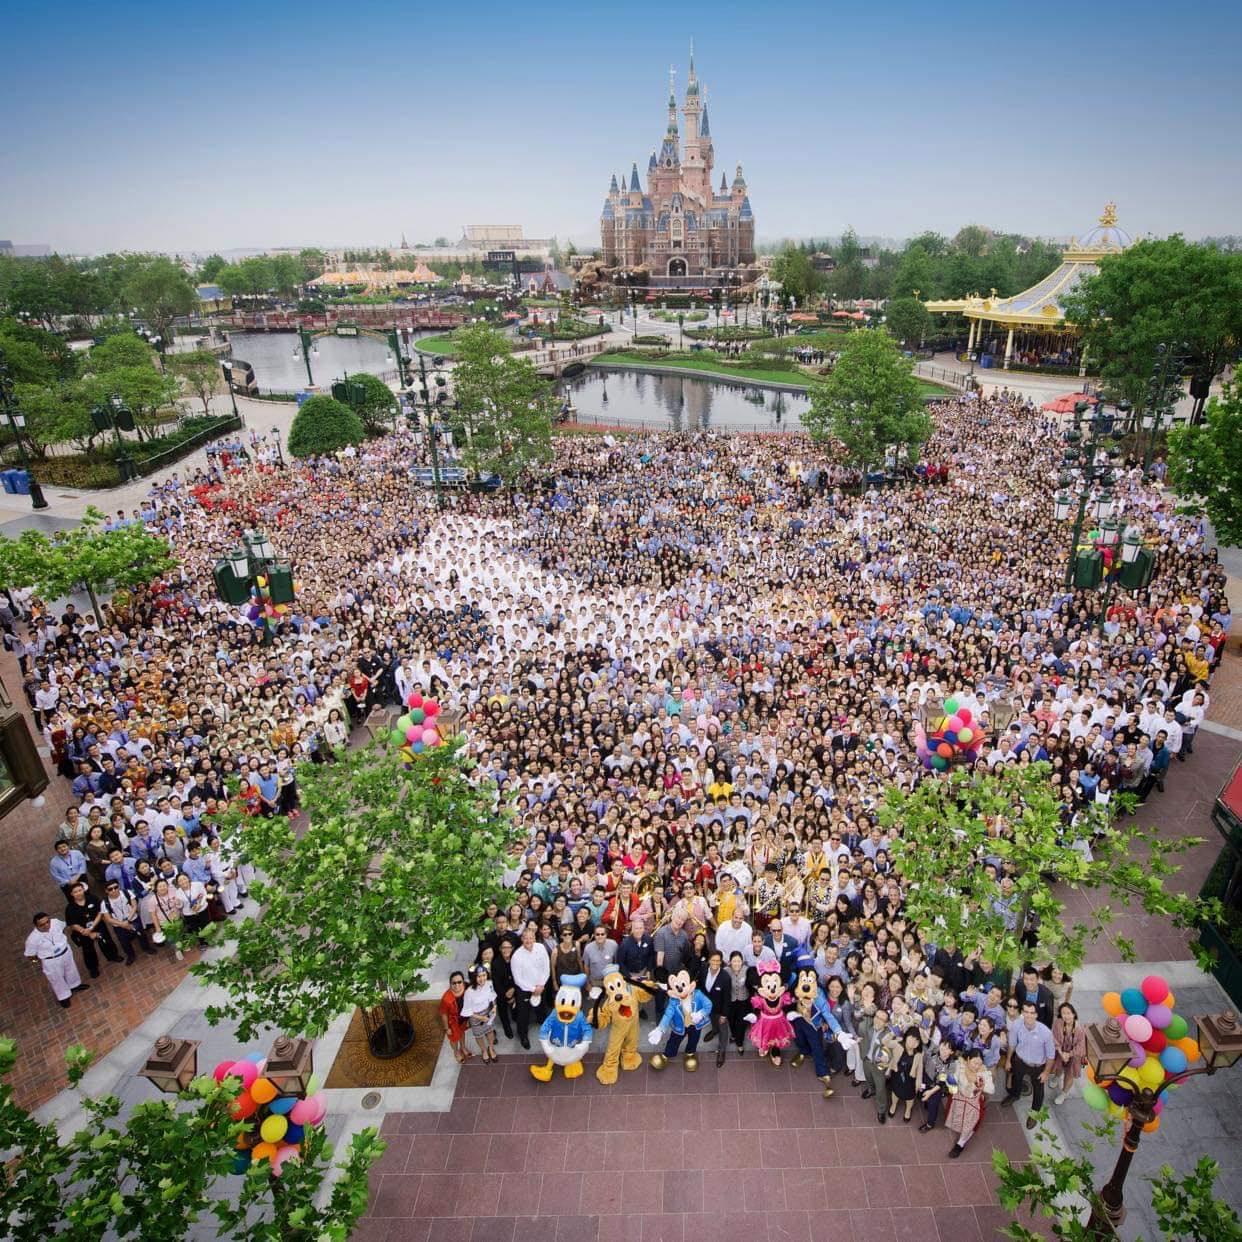 Shanghai Disney Resort cast members opening day